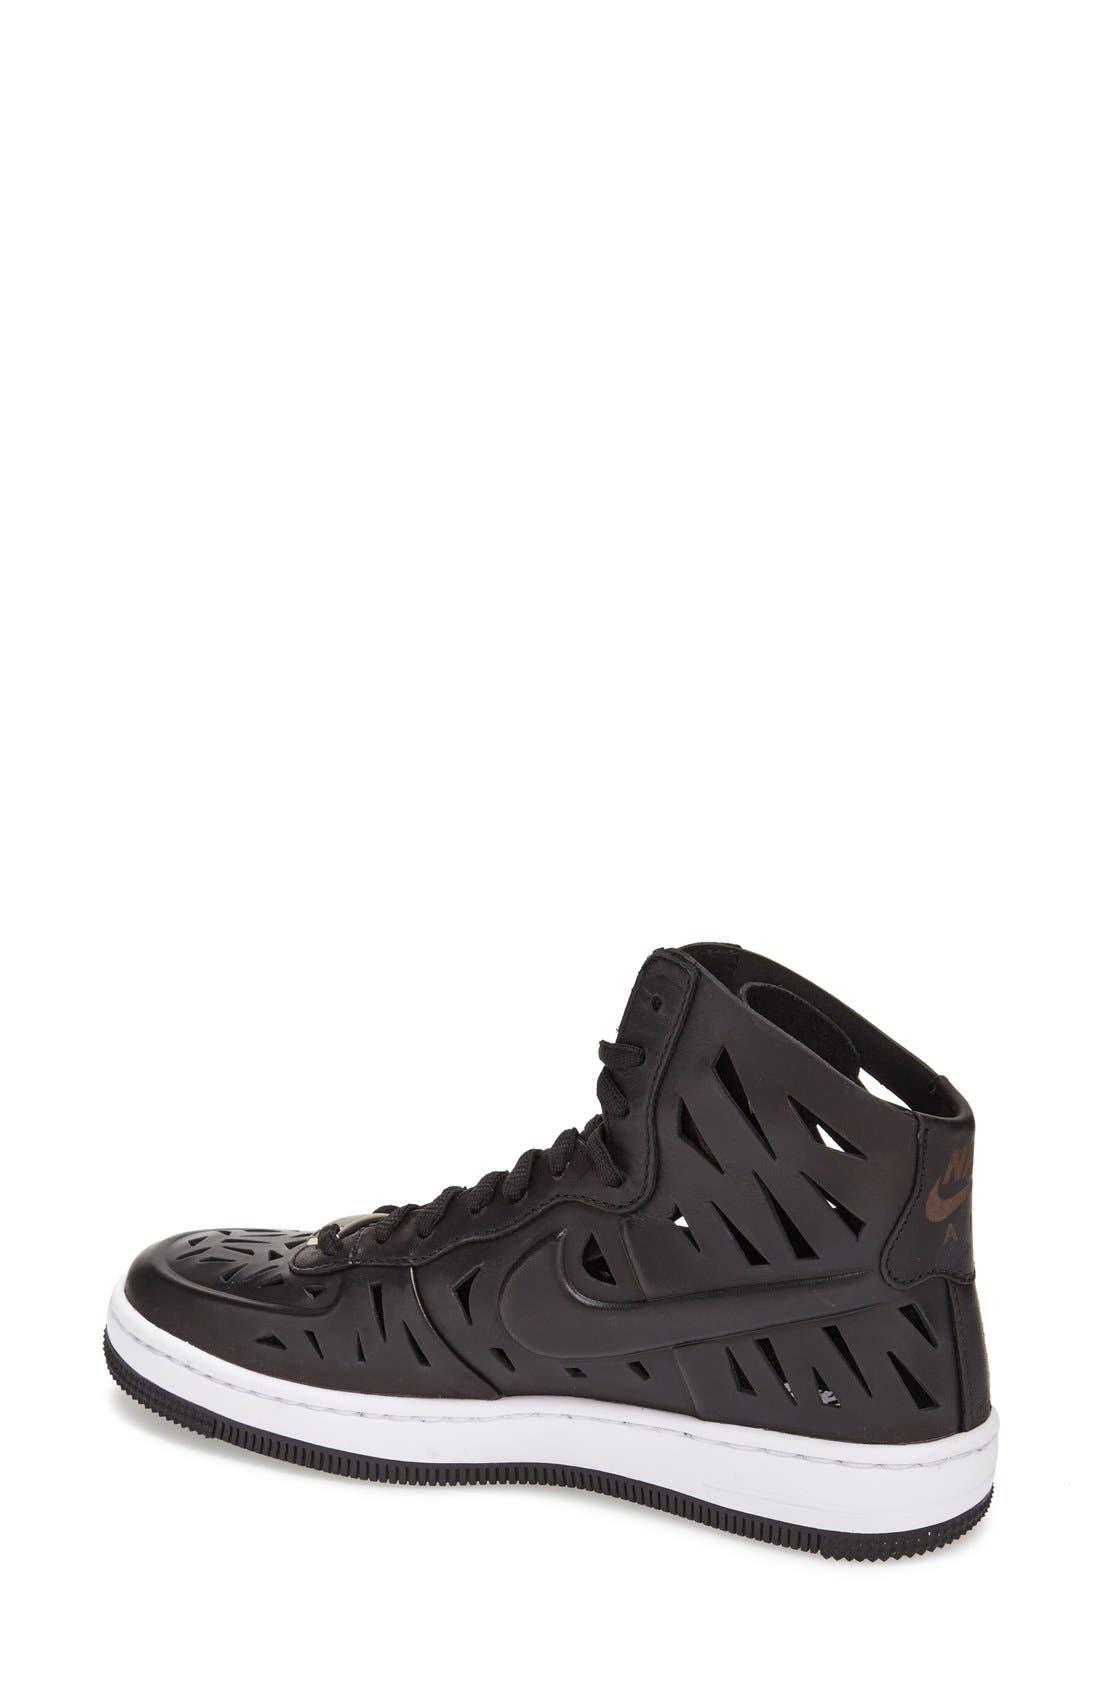 Alternate Image 3  - Nike 'AF1 Ultra Force Mid Joli' High Top Sneaker (Women)